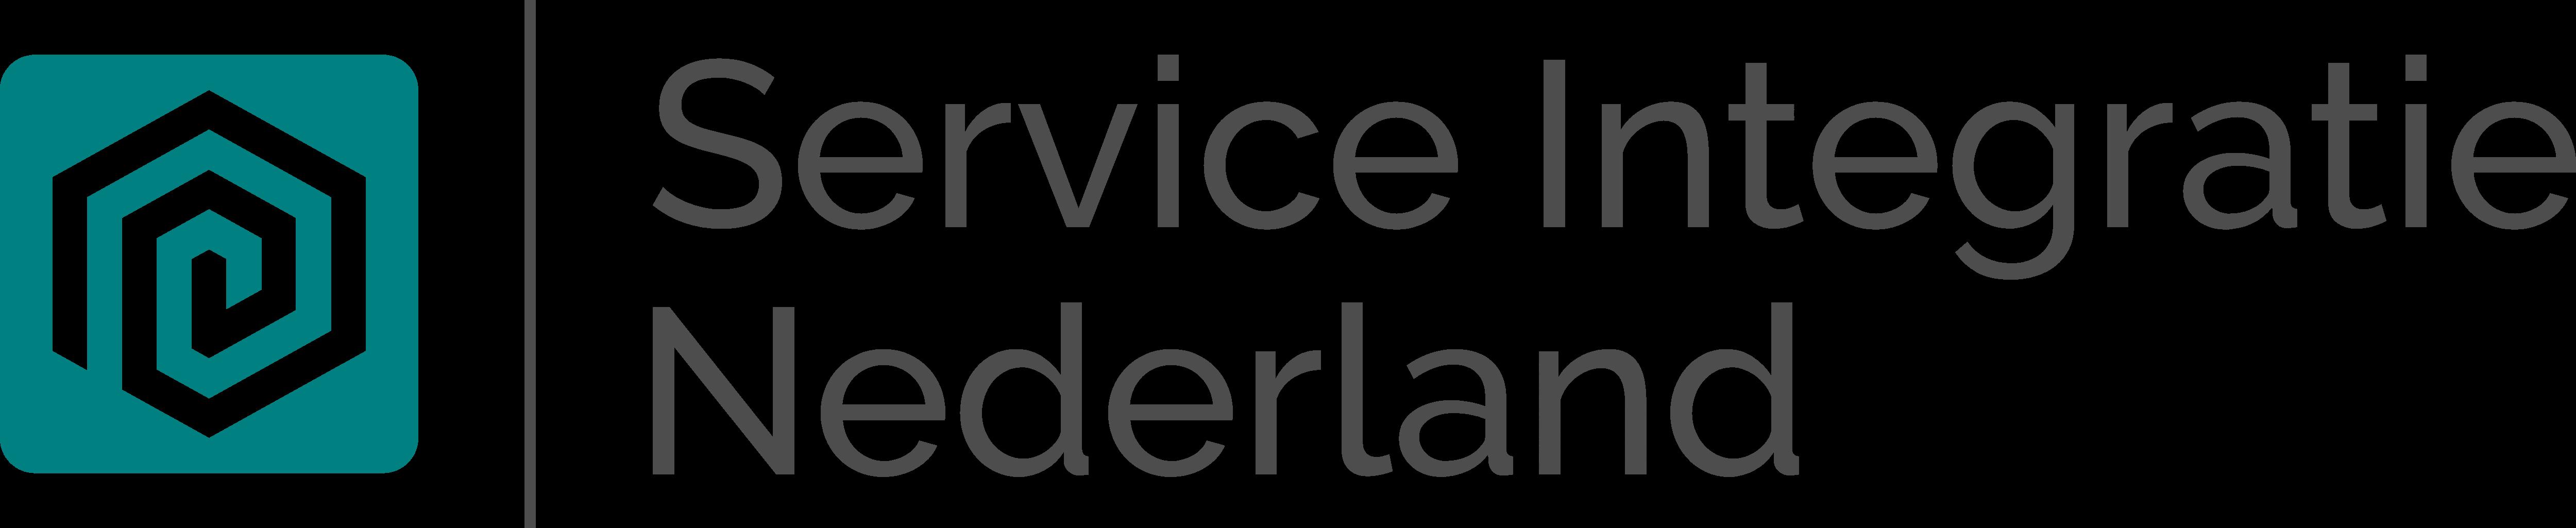 Service Integratie Nederland